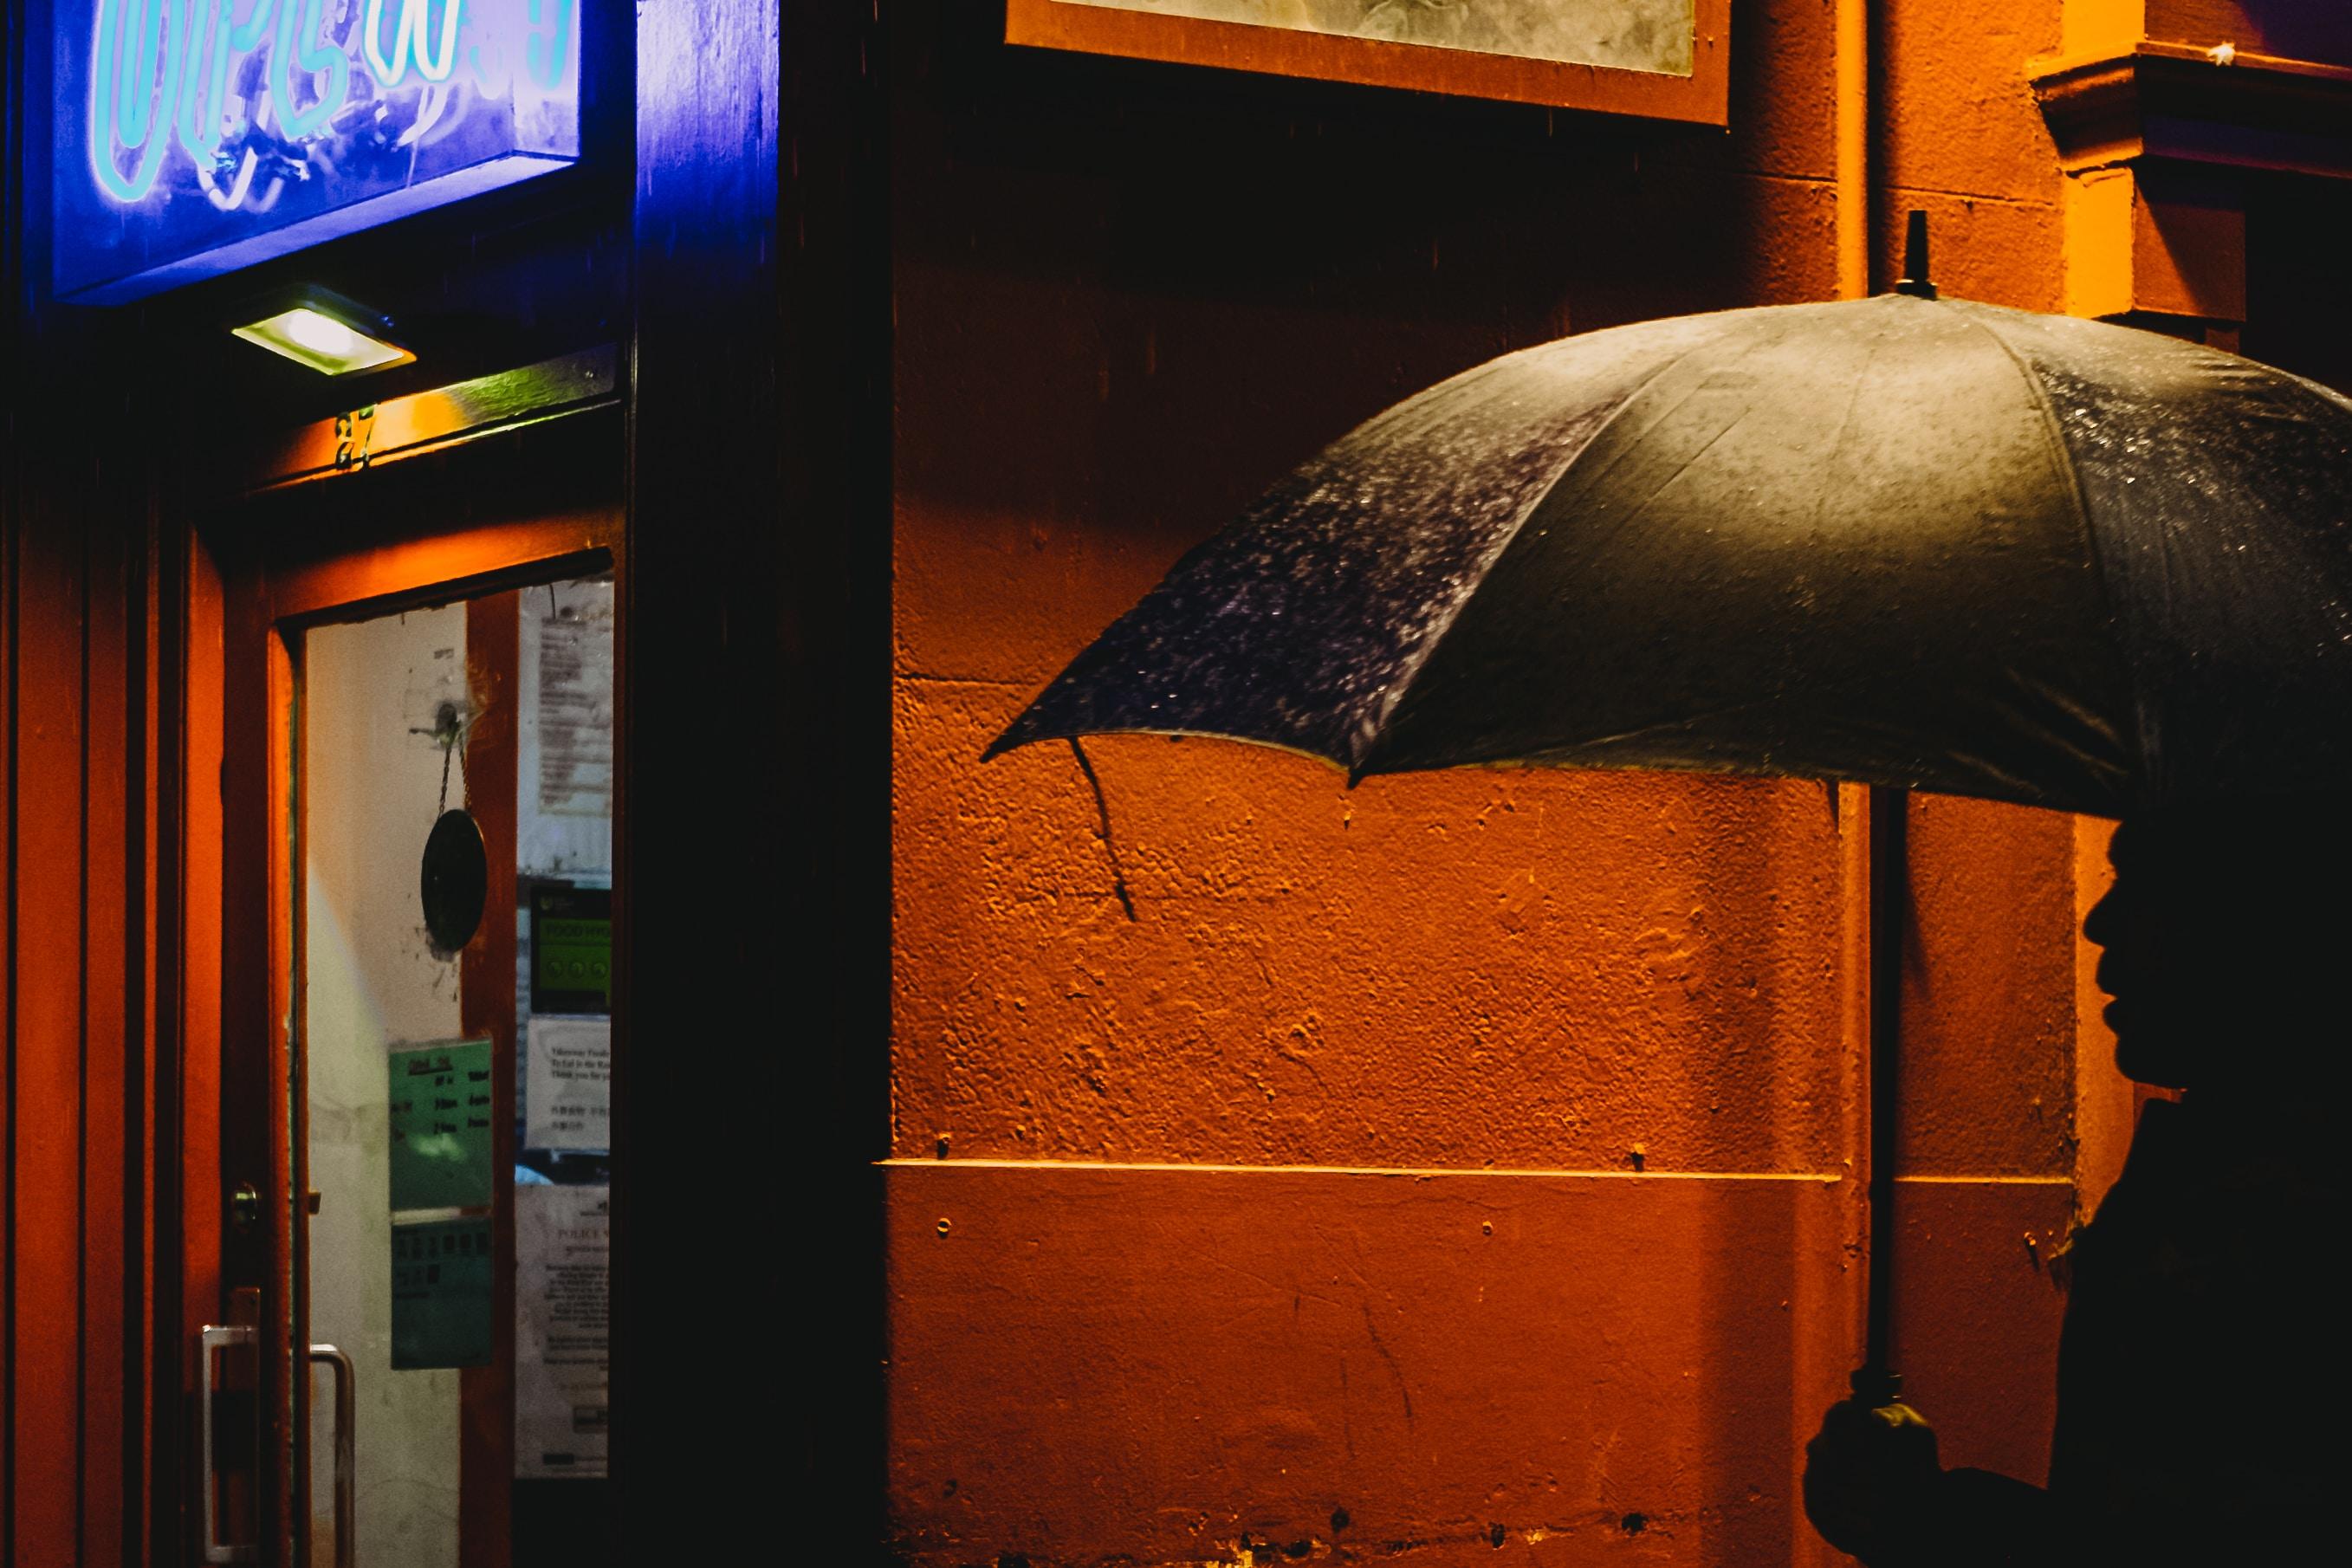 silhouette of person holding umbrella